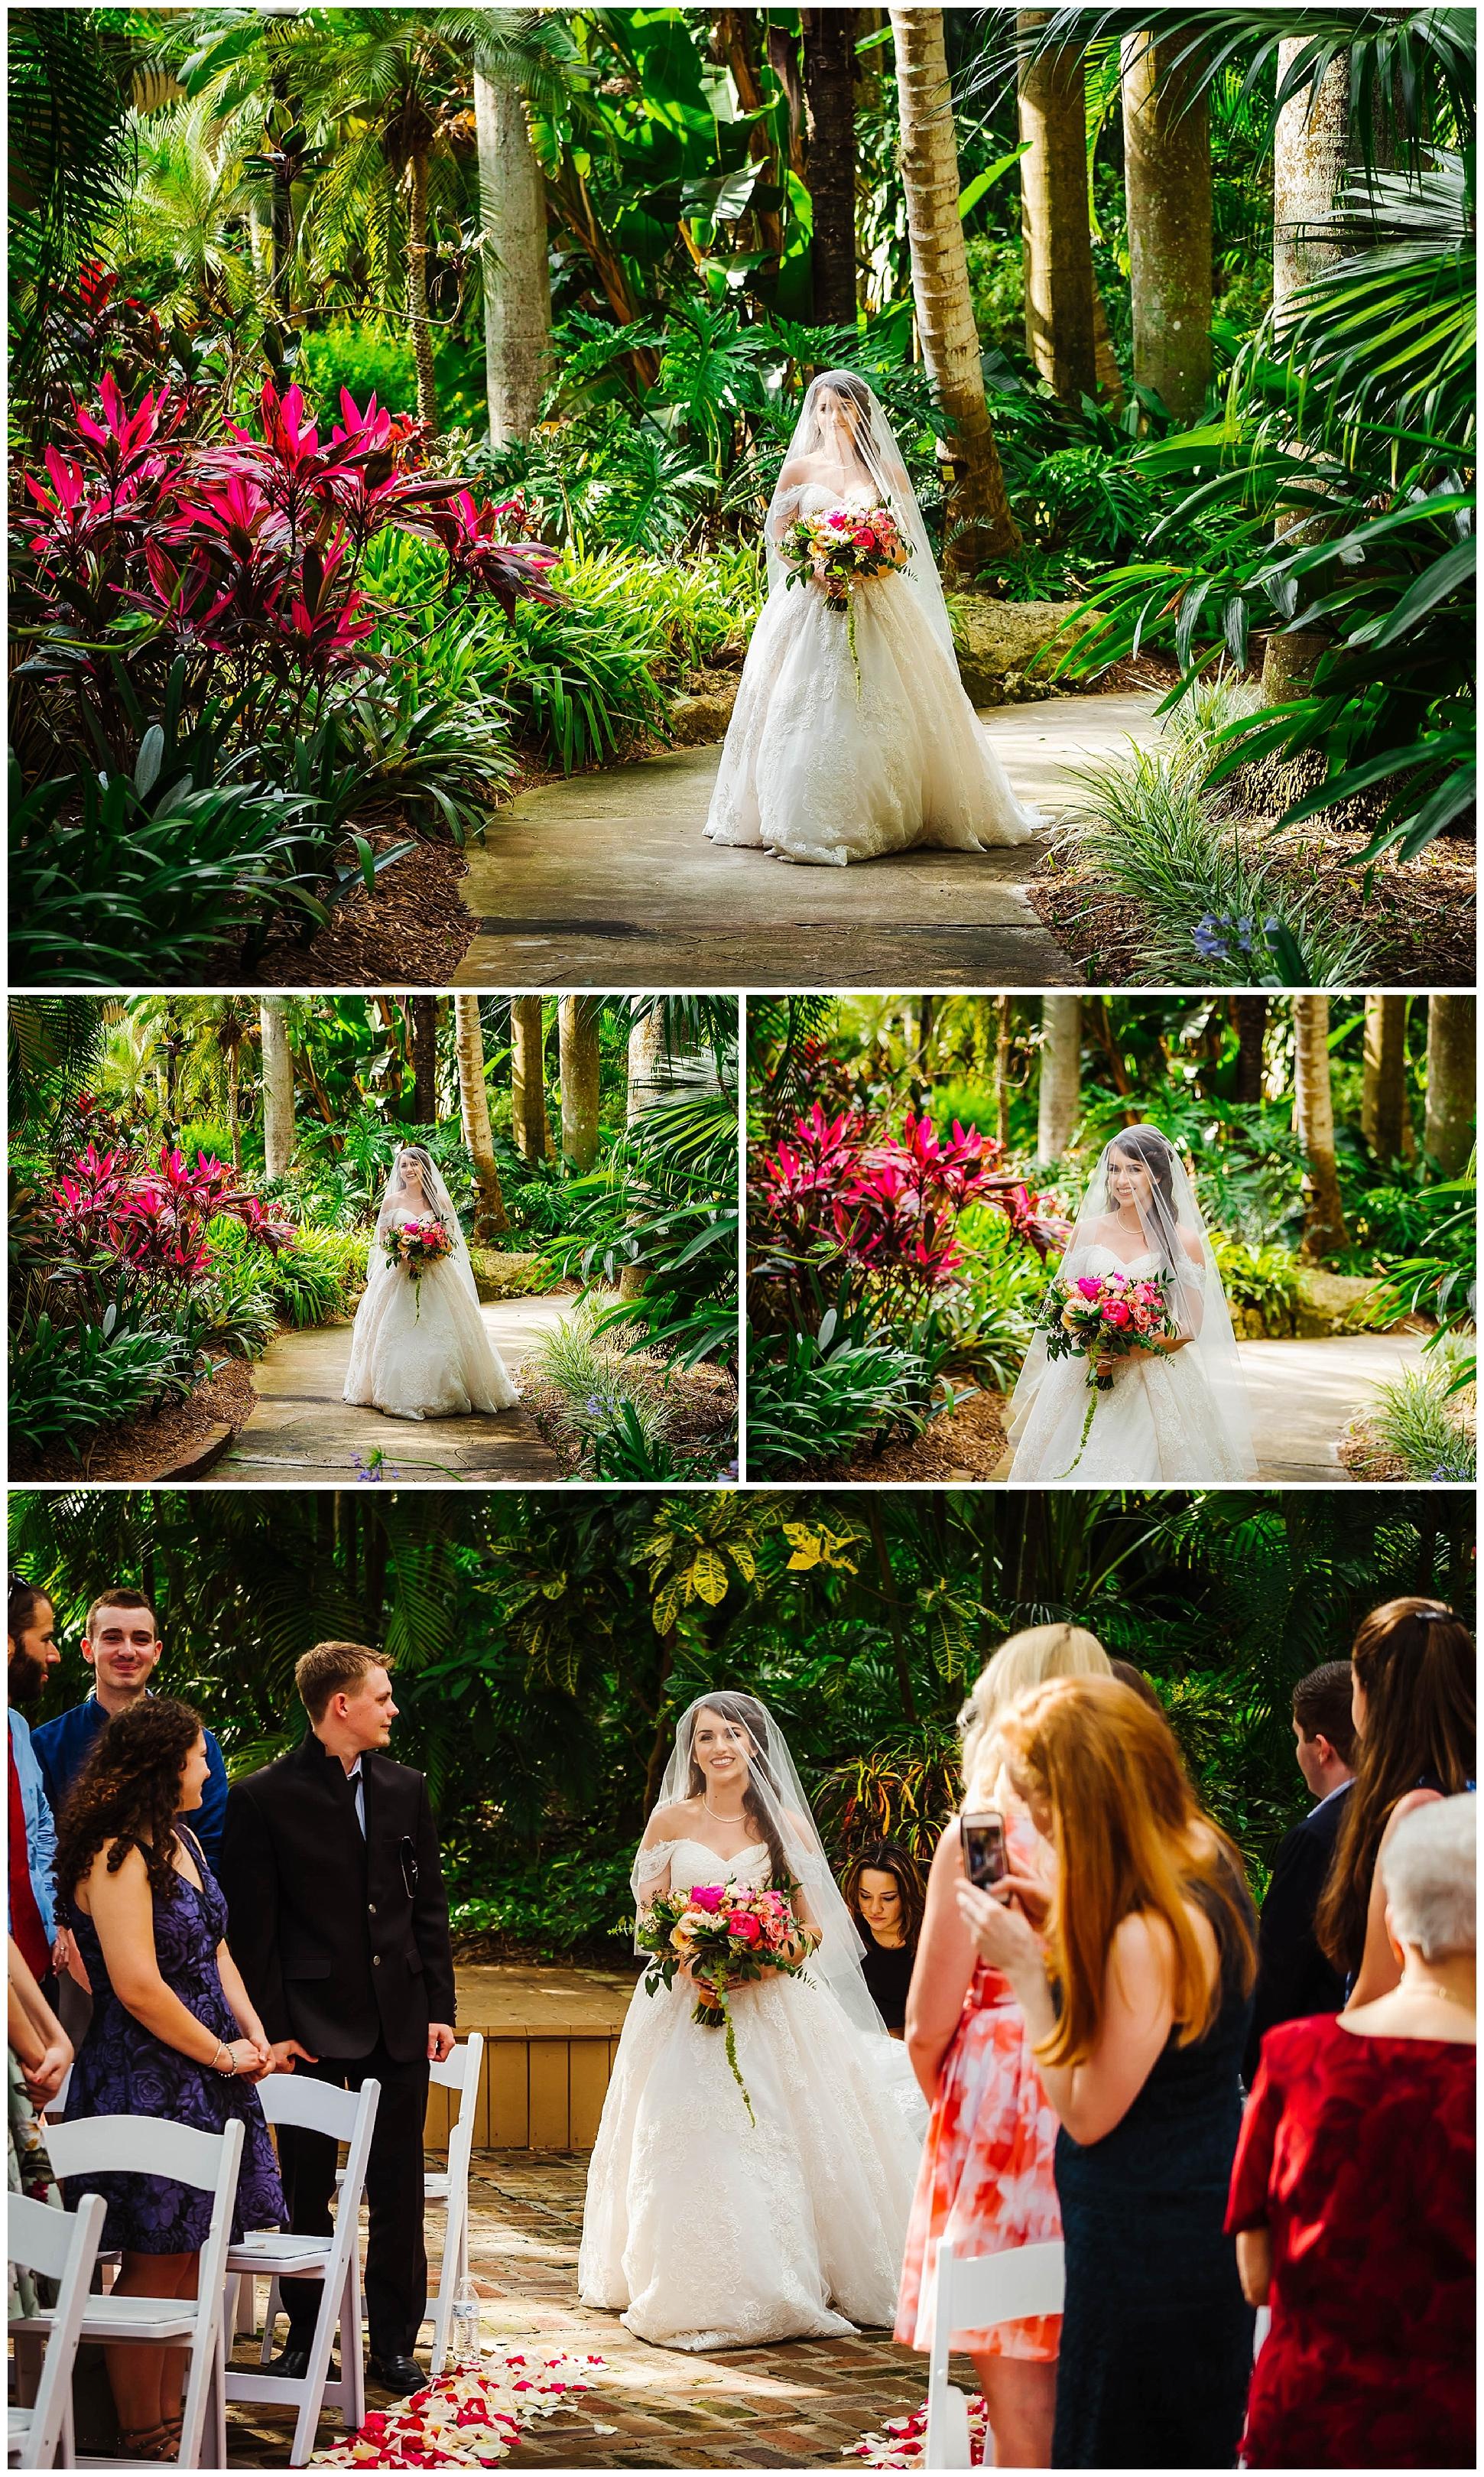 st-pete-wedding-photographer-sunken-gardens-crystal-ballroom-princess-dancer_0148.jpg